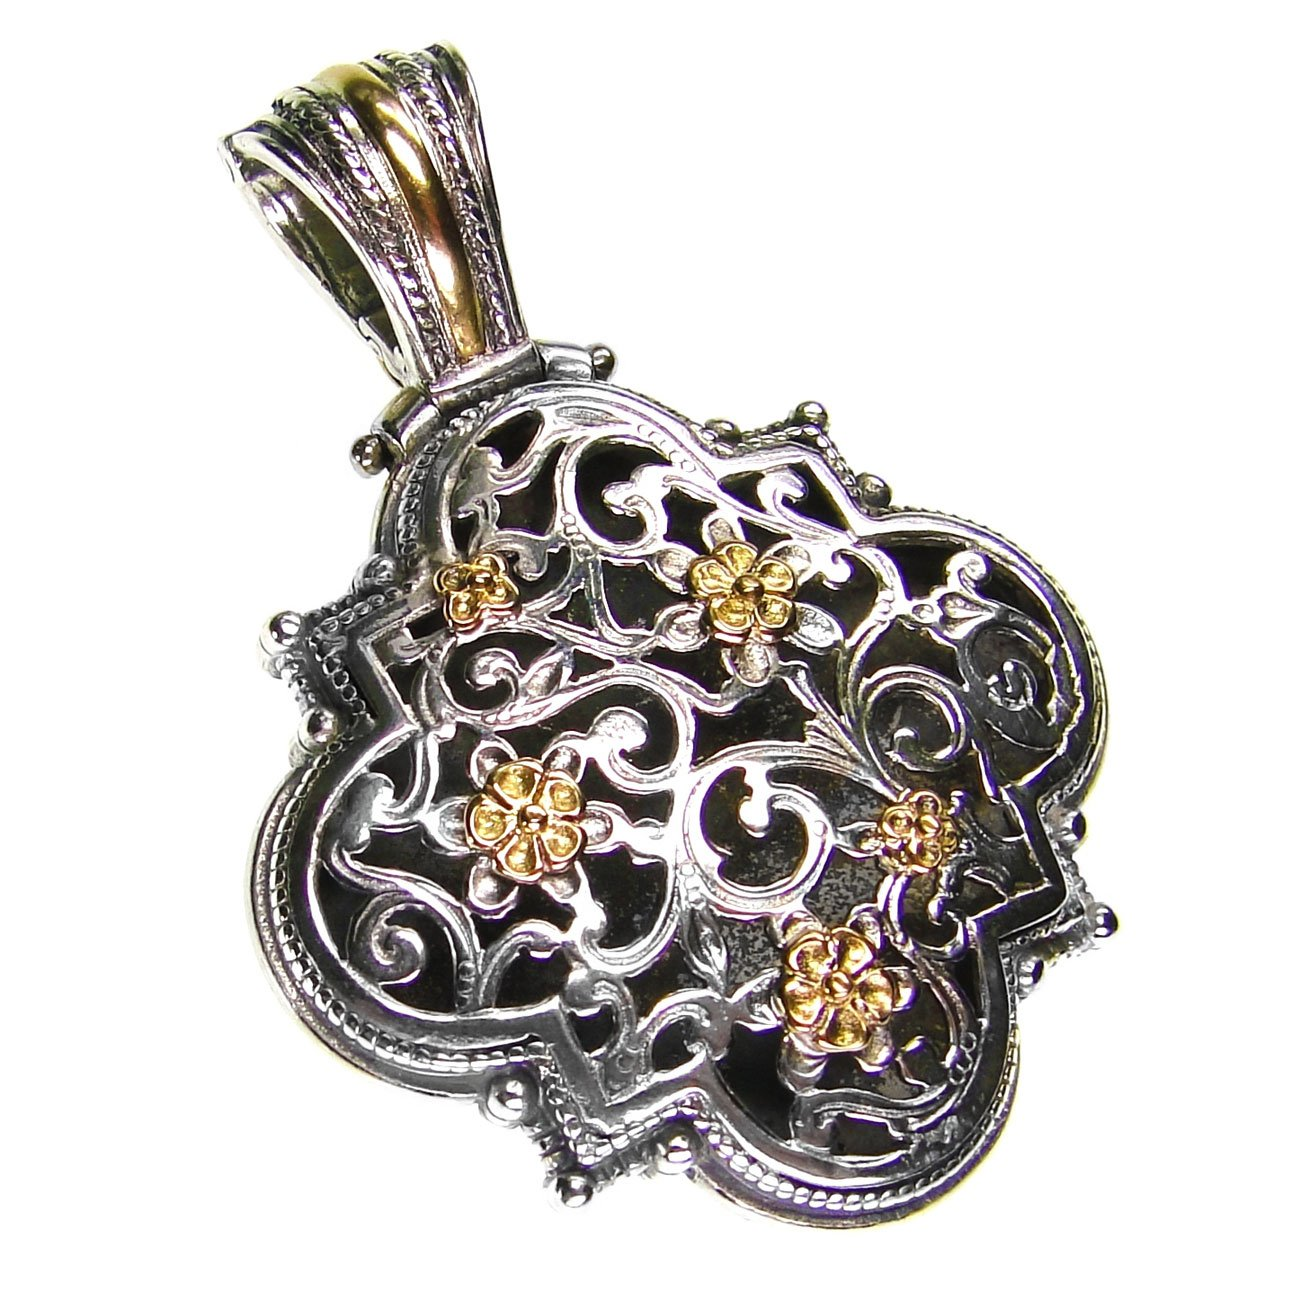 Gerochristo 3255 - Solid Gold & Silver Medieval Byzantine Filigree Pendant